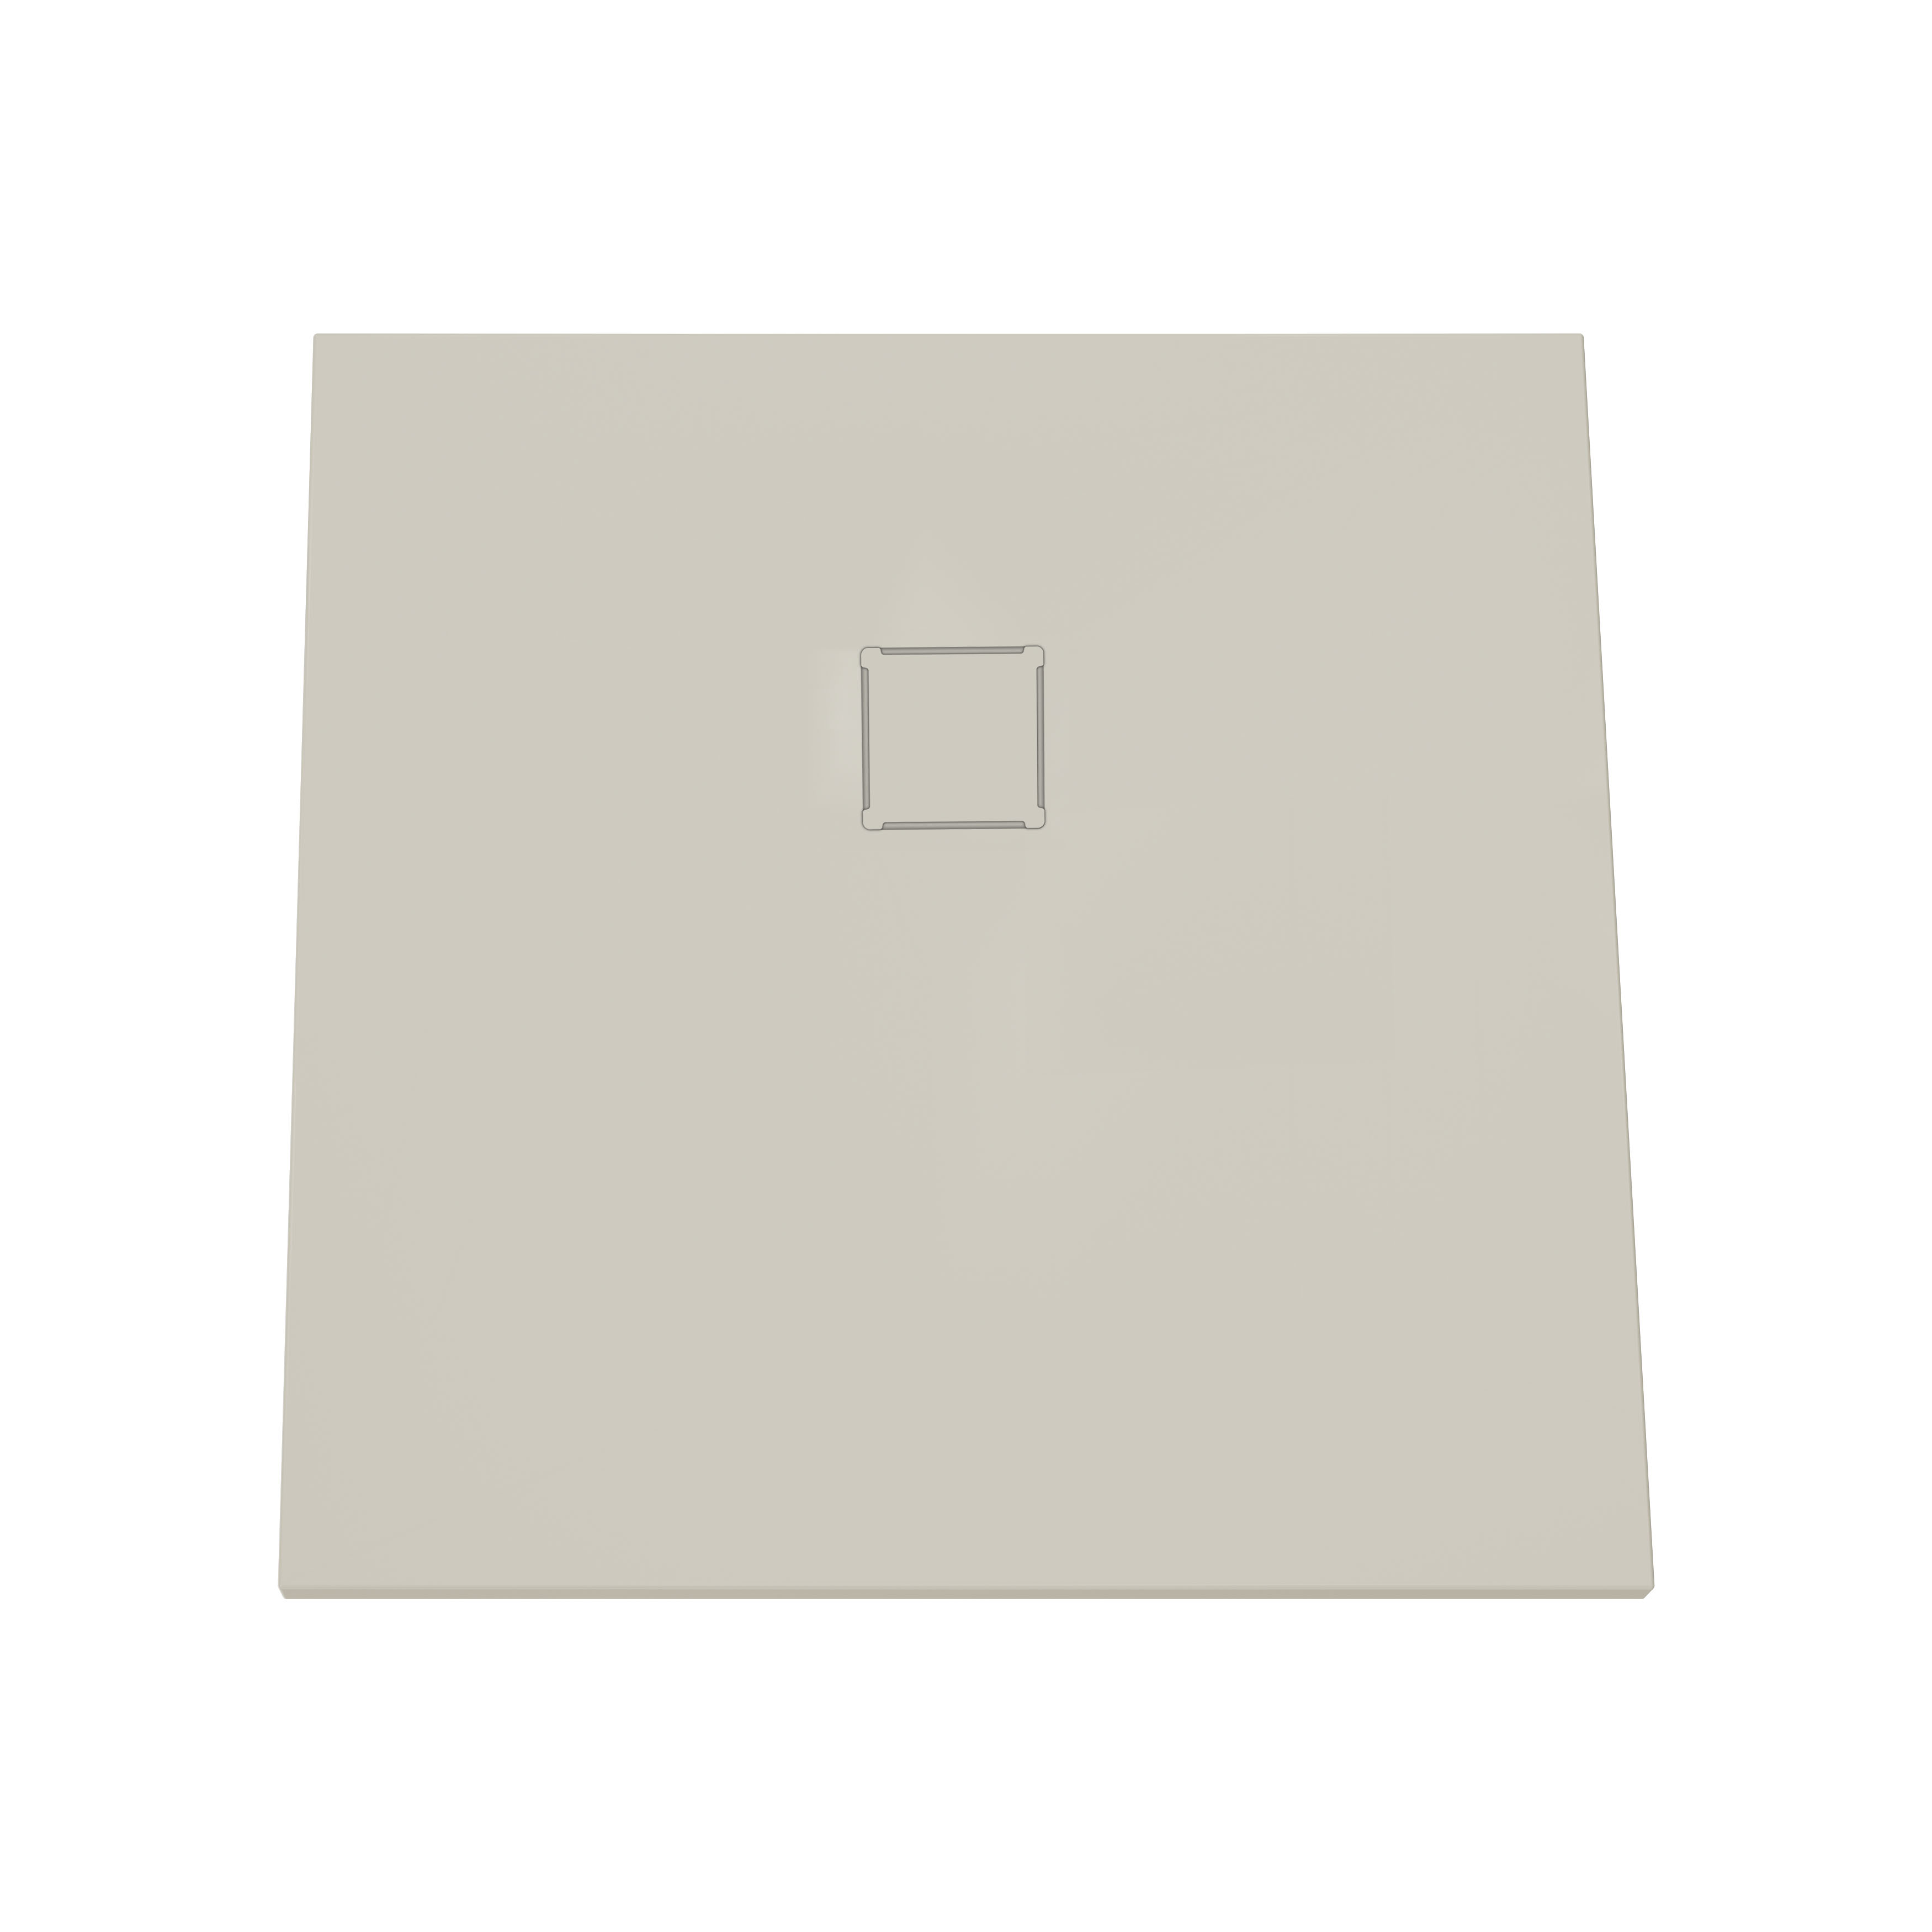 V-stone, receveur ultra plat en solid stone, 80 cm, taupe